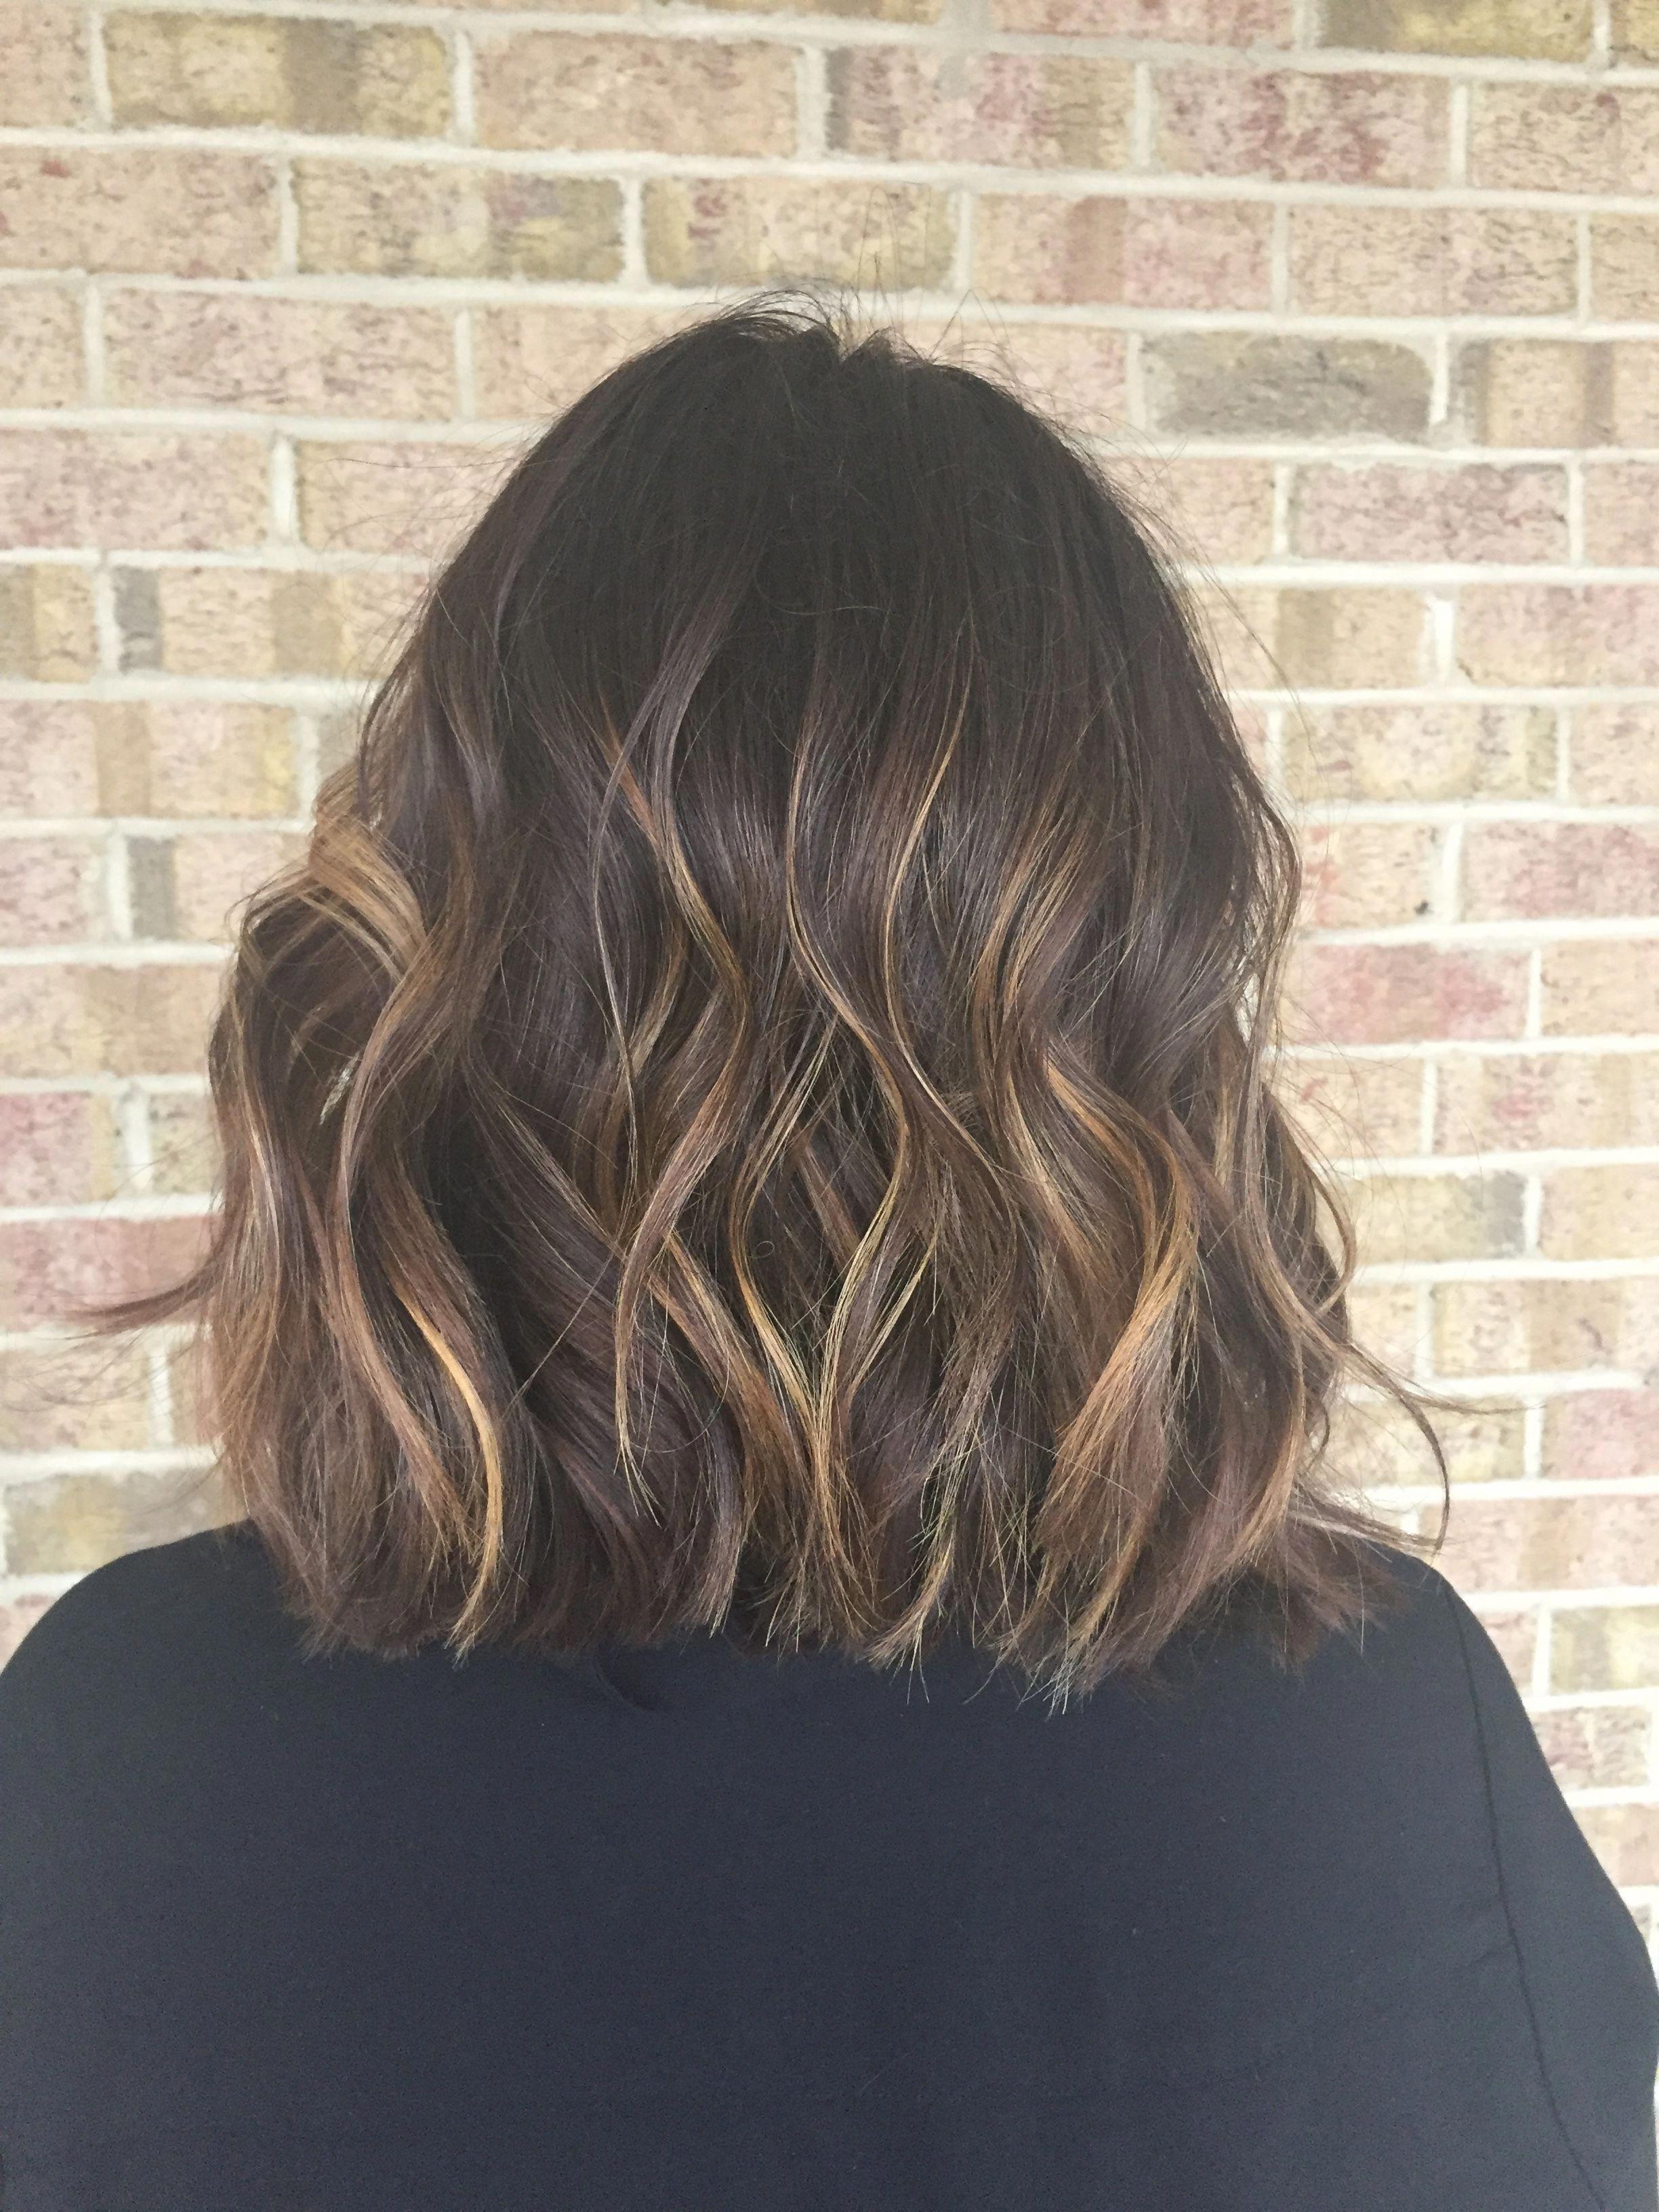 Brunette Balayage Short Hair Brunettebalayageshorthair Short Hair Balayage Hair Styles Short Balayage